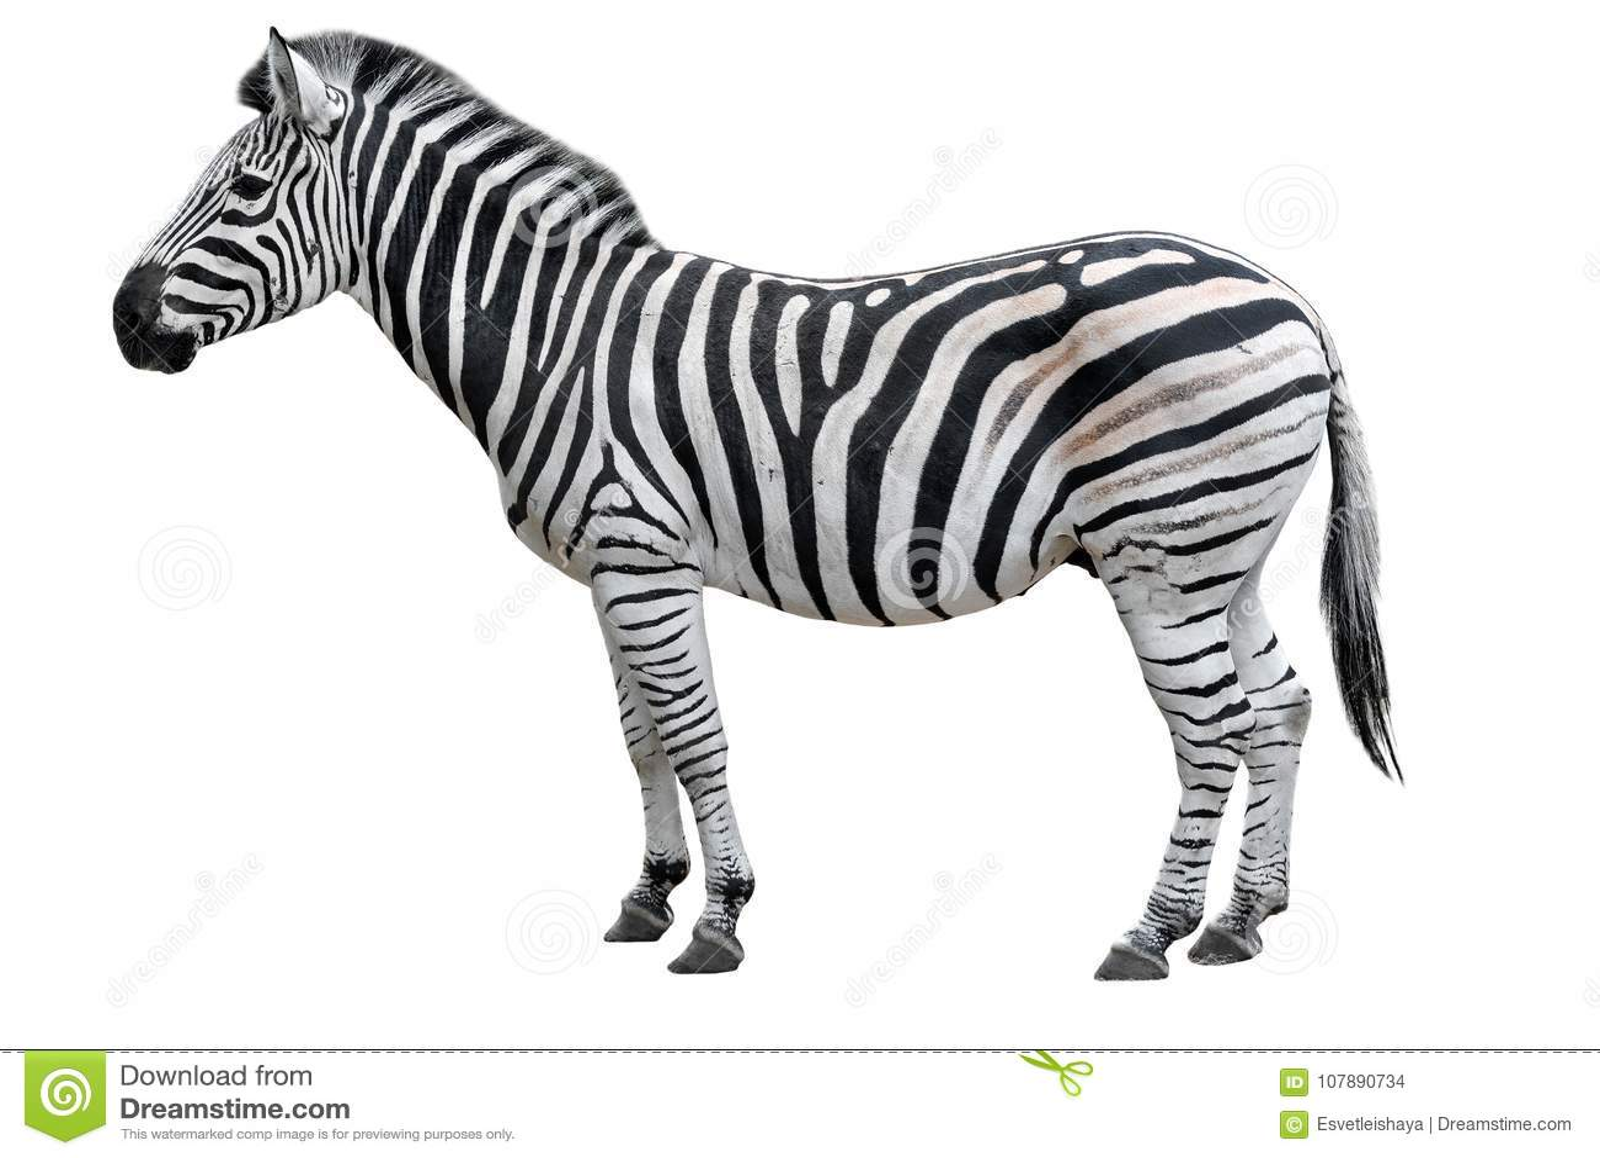 Zebra Cutout Stock Photos